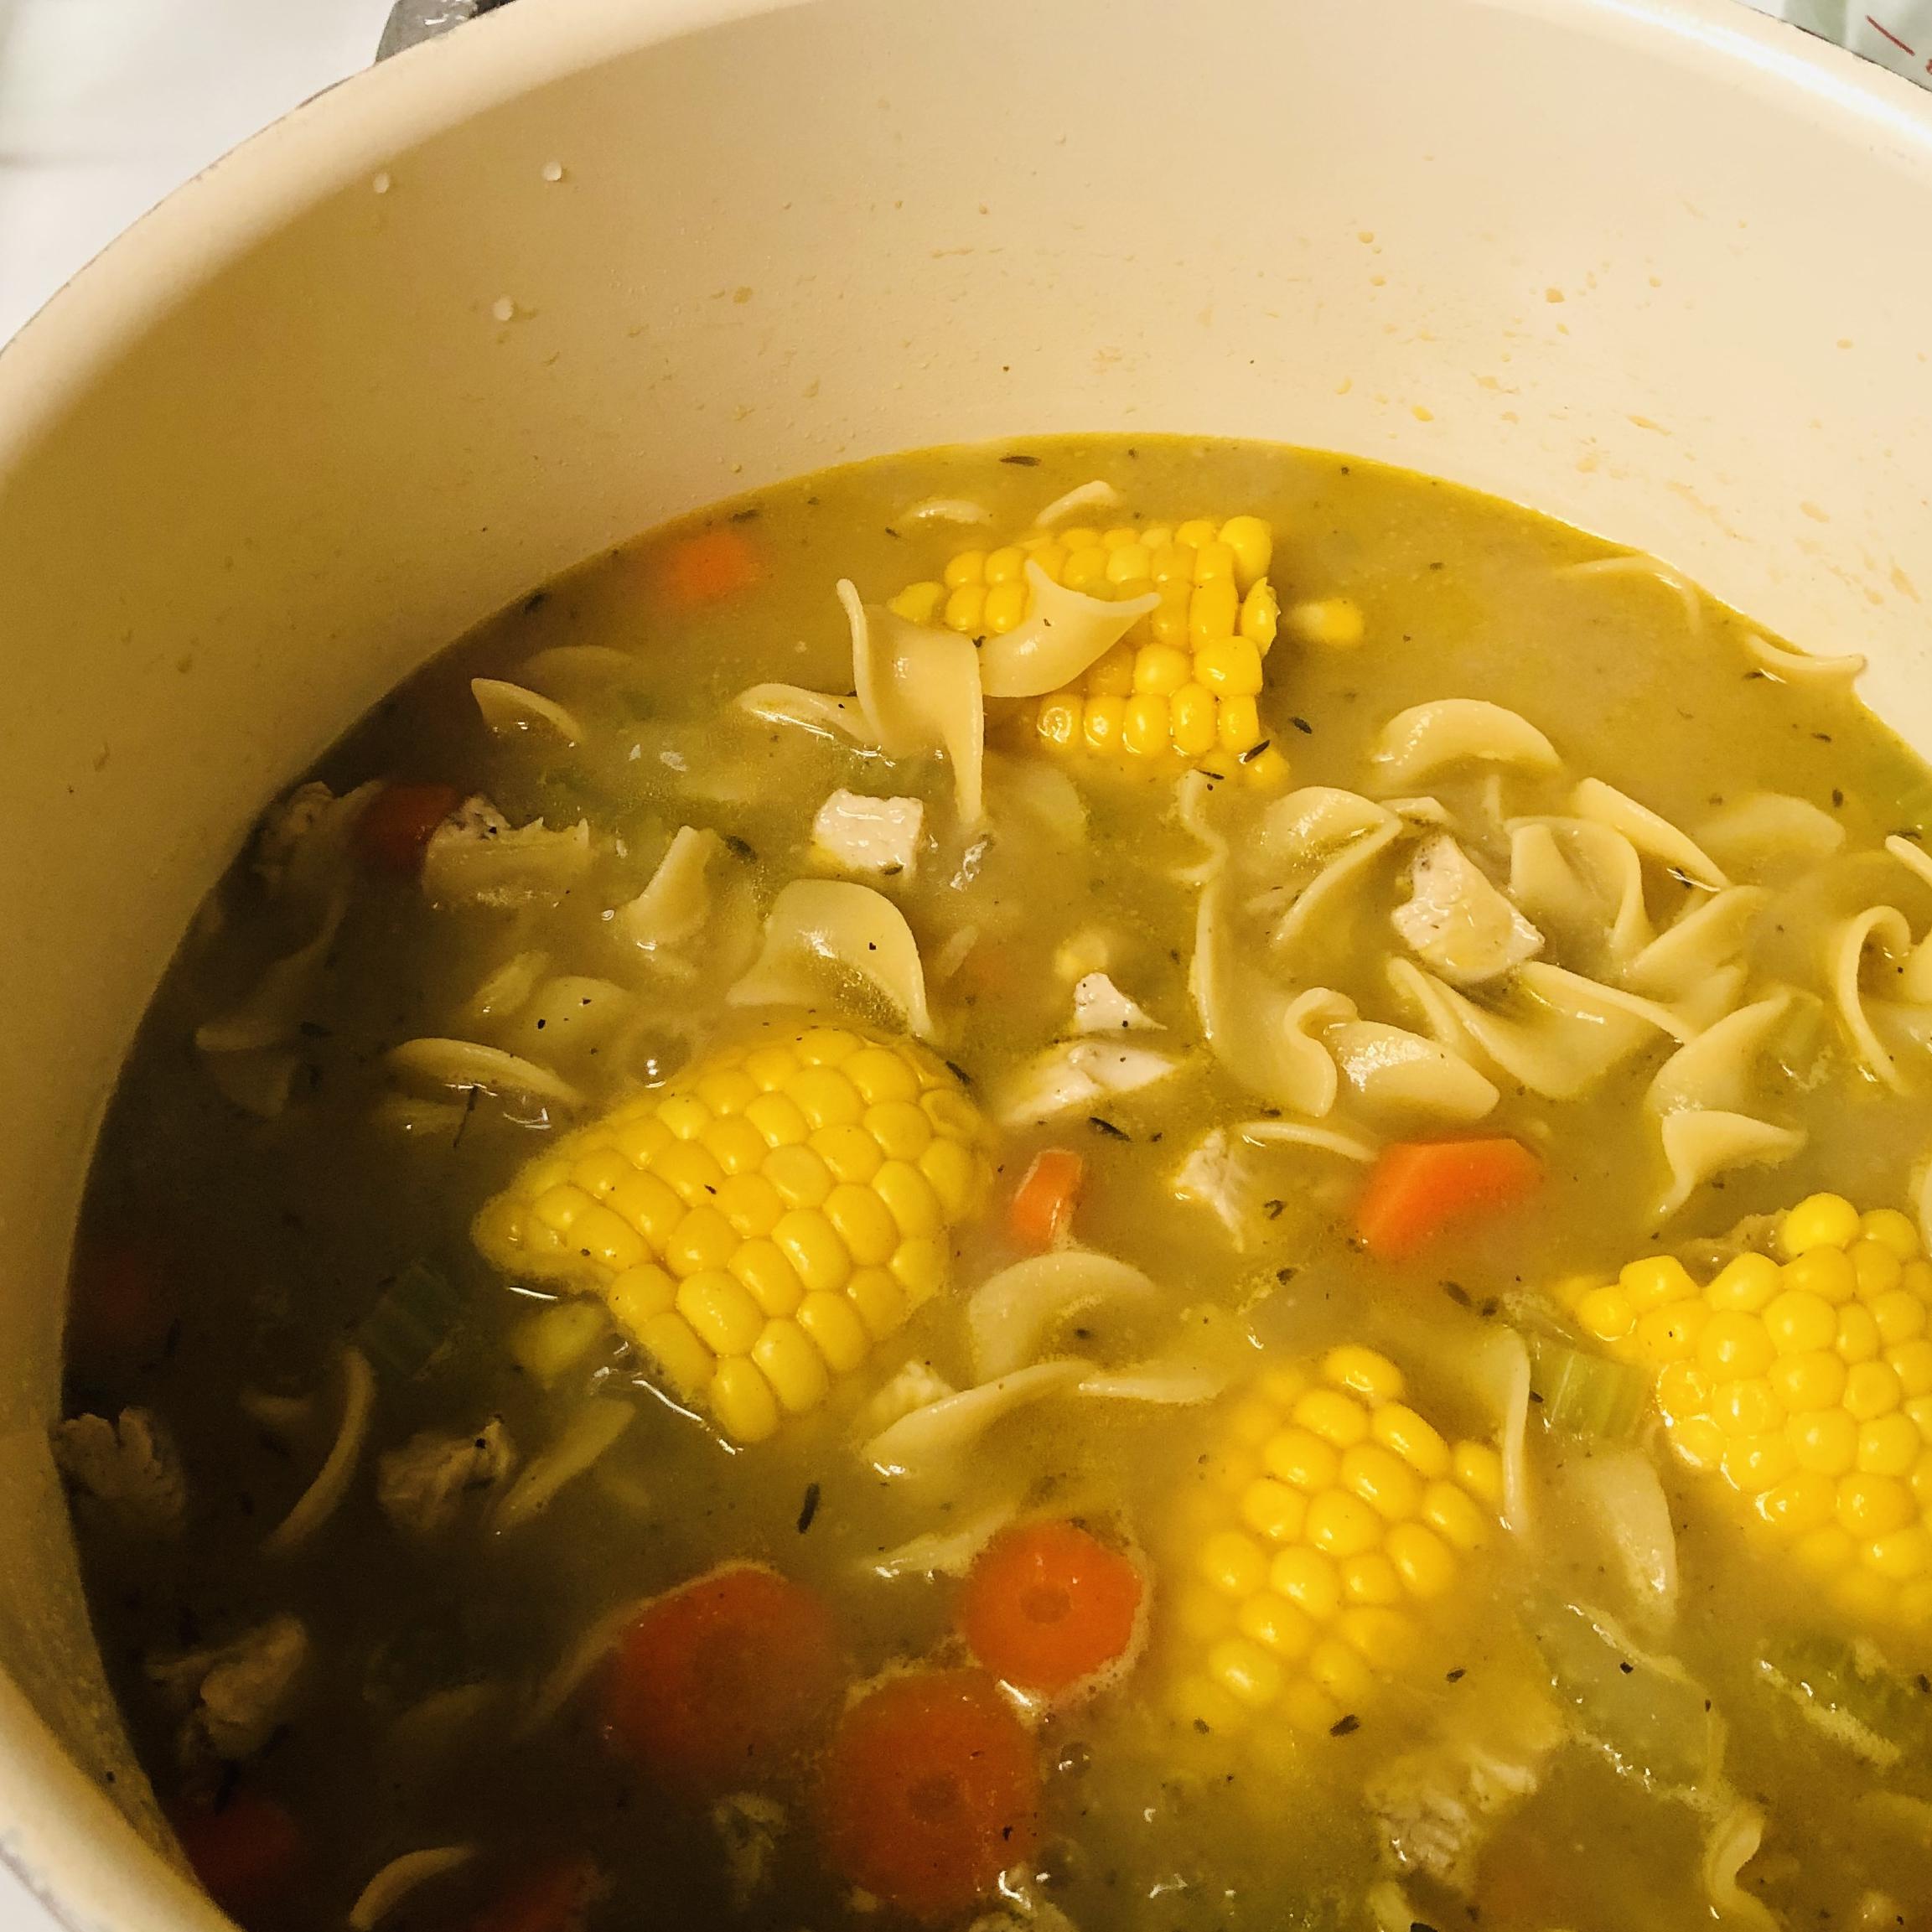 Chef John's Homemade Chicken Noodle Soup Juani Loor